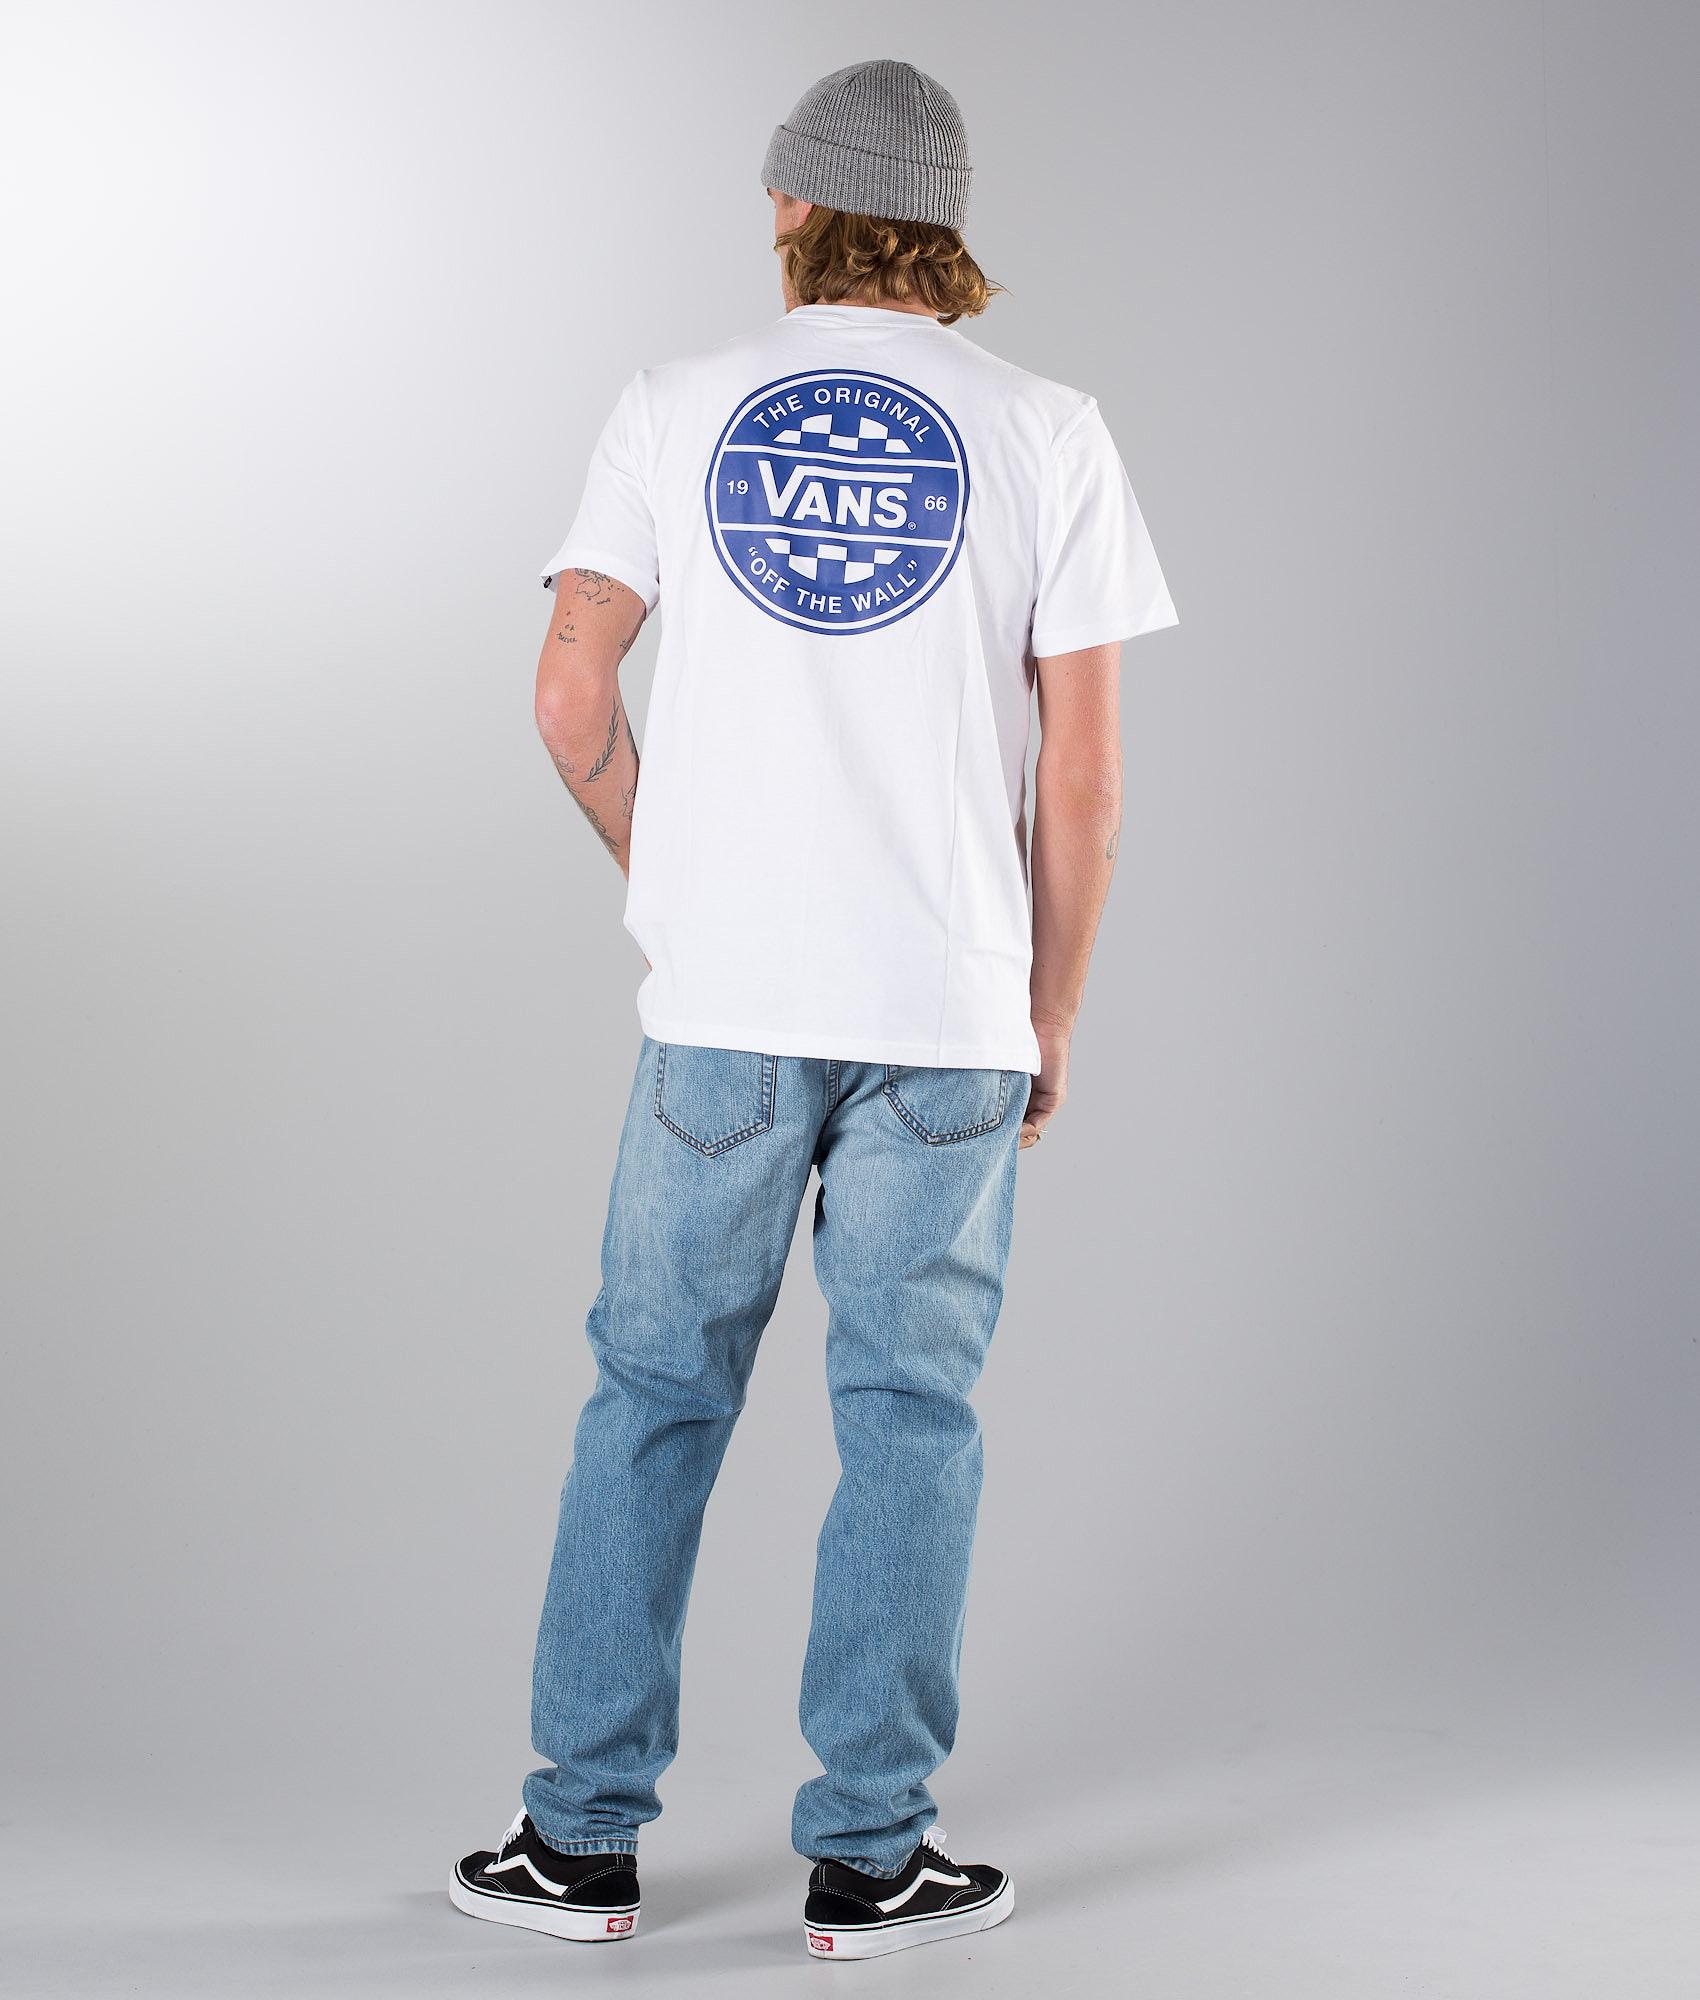 1f9c4eec Vans Checker Co. T-shirt White - Ridestore.com